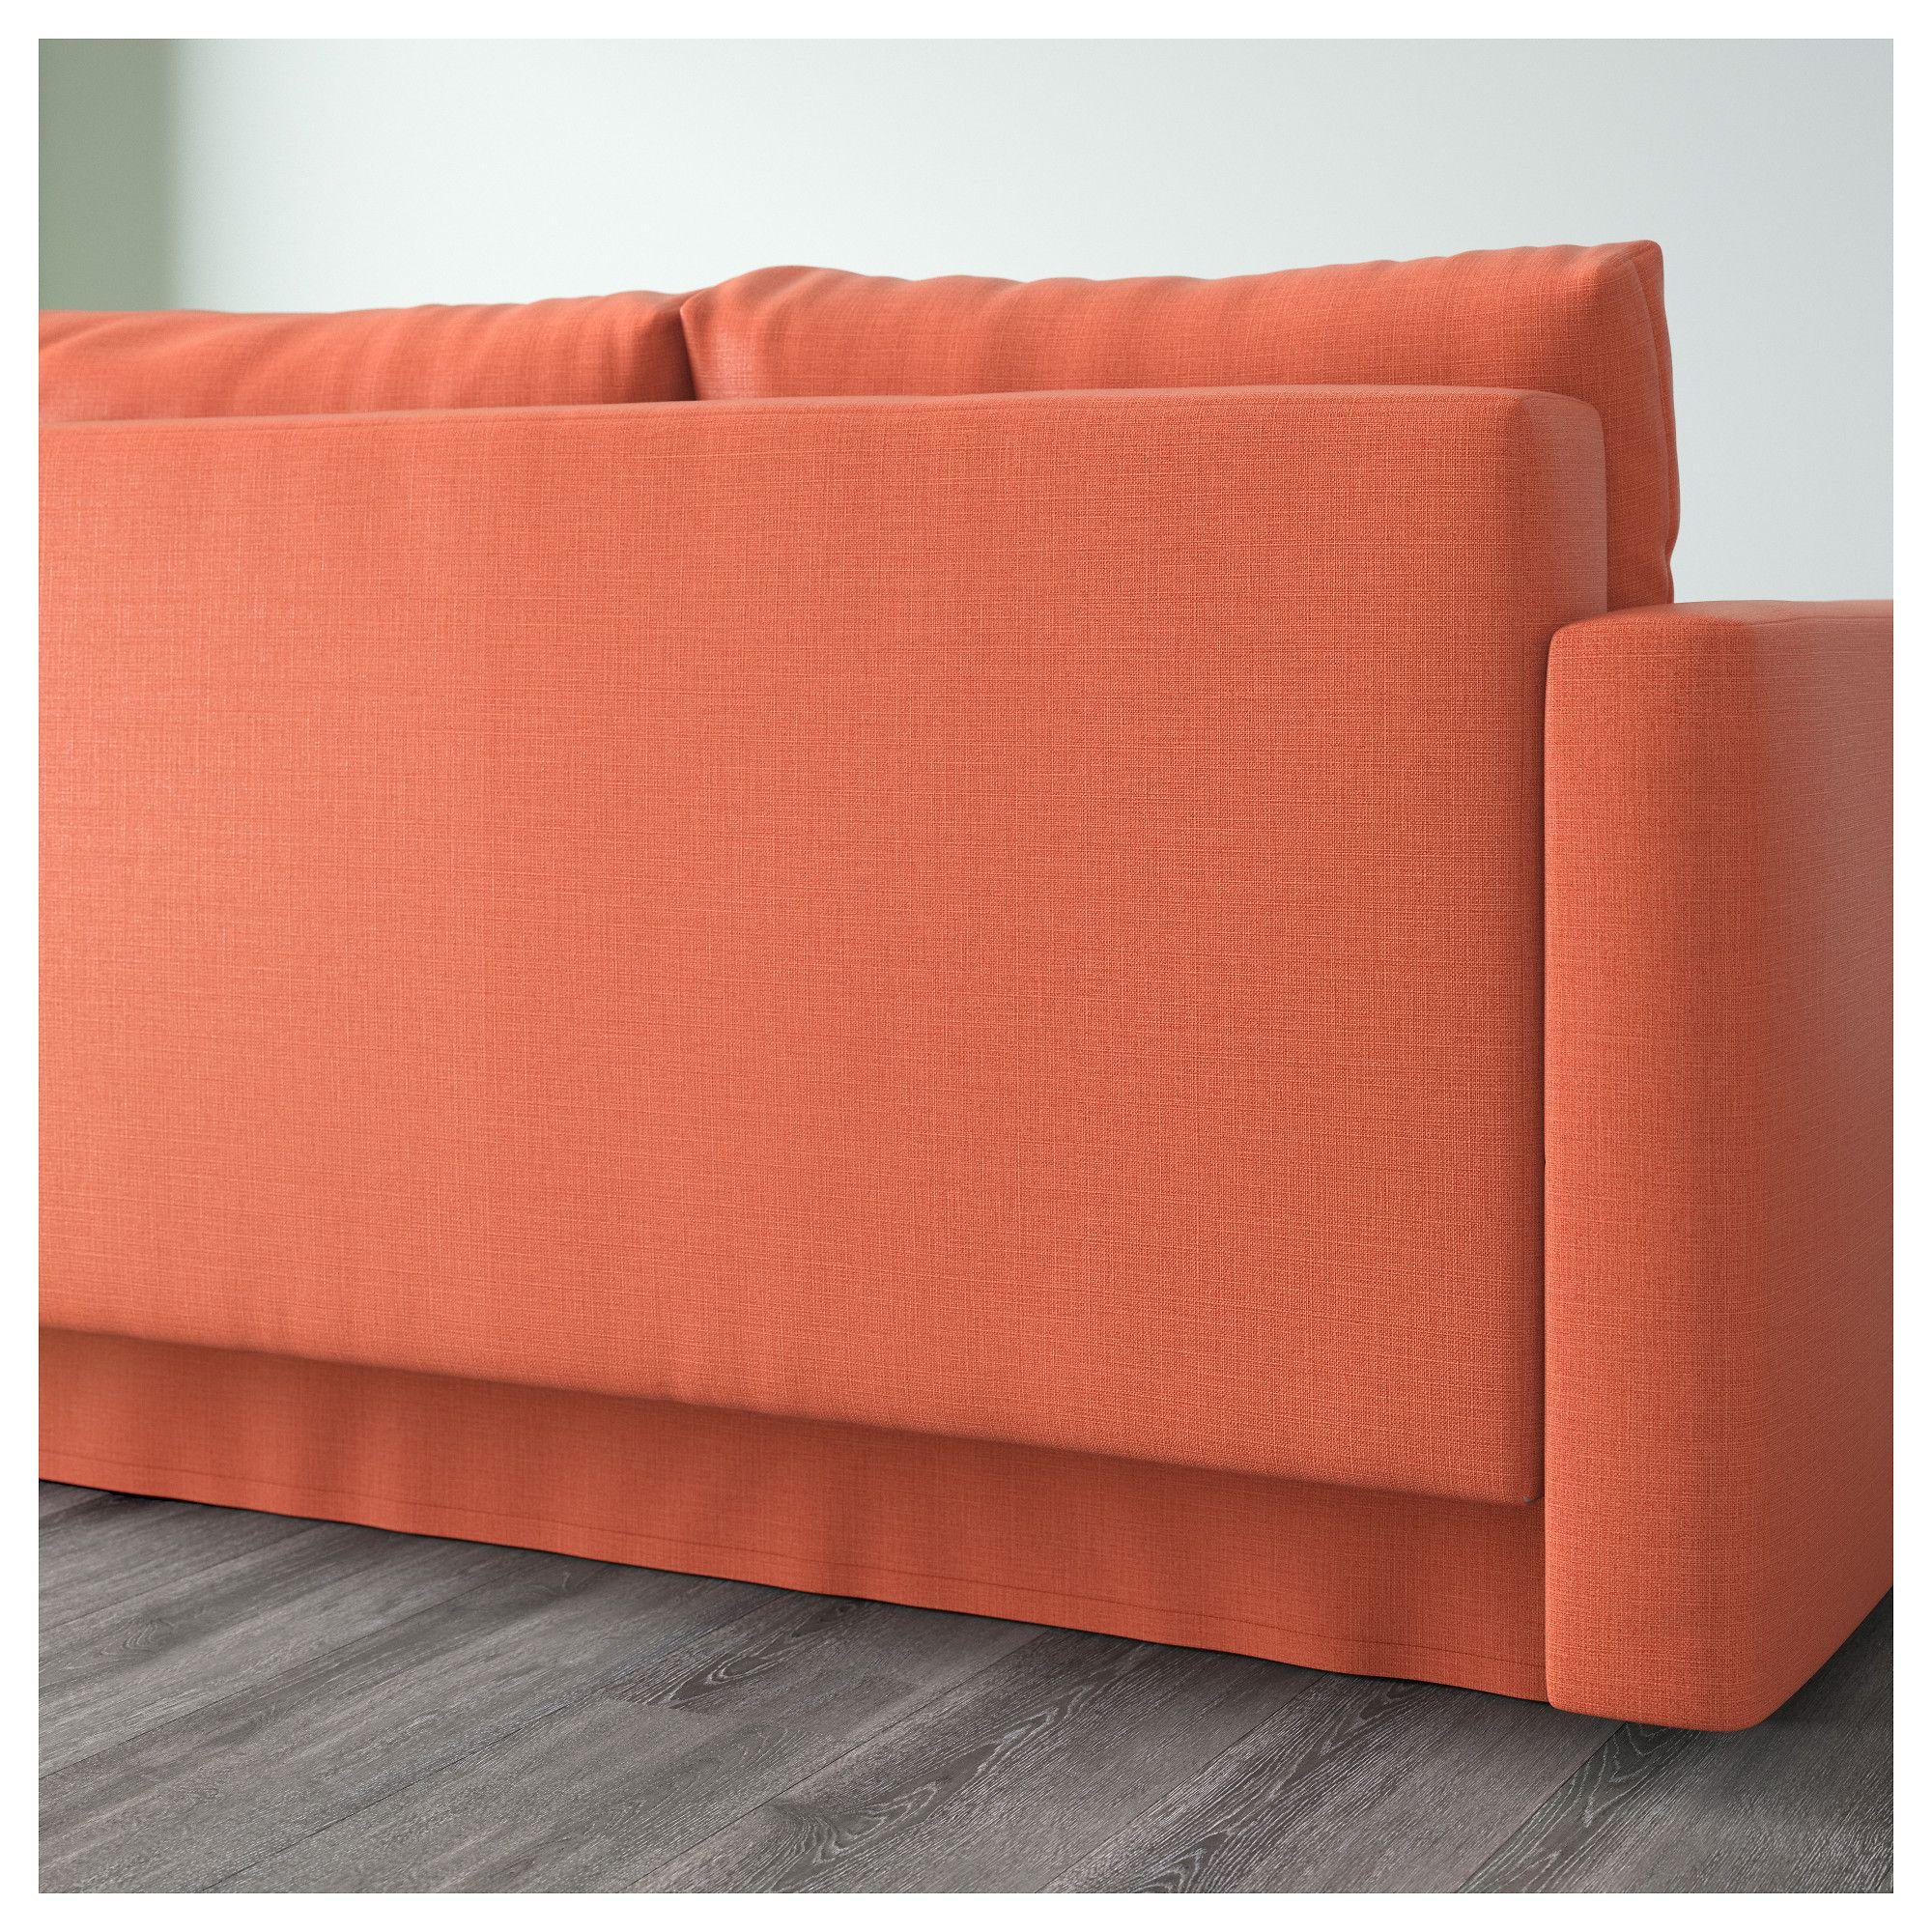 Furniture And Home Furnishings Ikea Friheten Meuble Meuble Canape